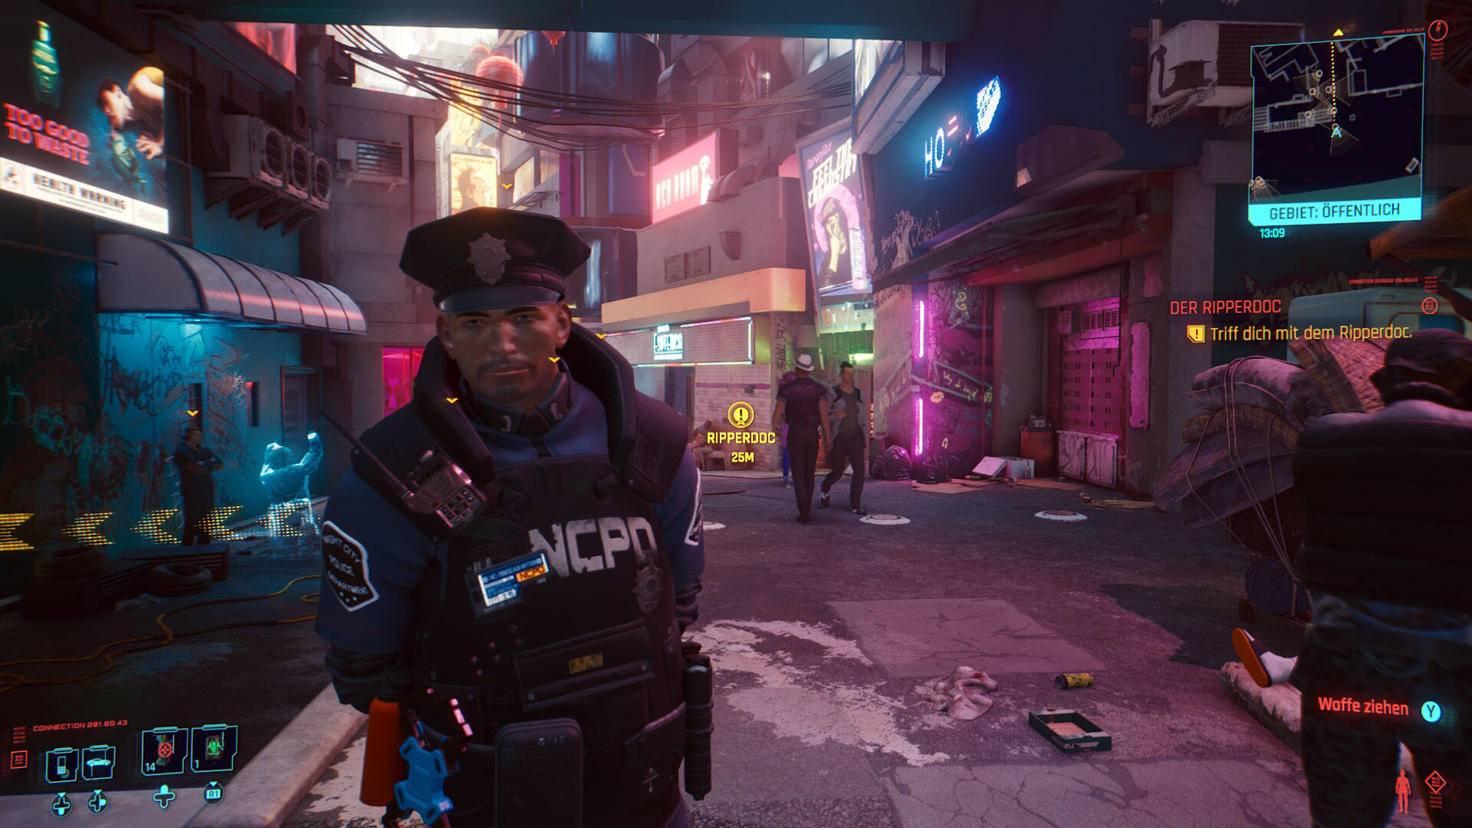 cyberpunk-2077-stadia-screenshot-03